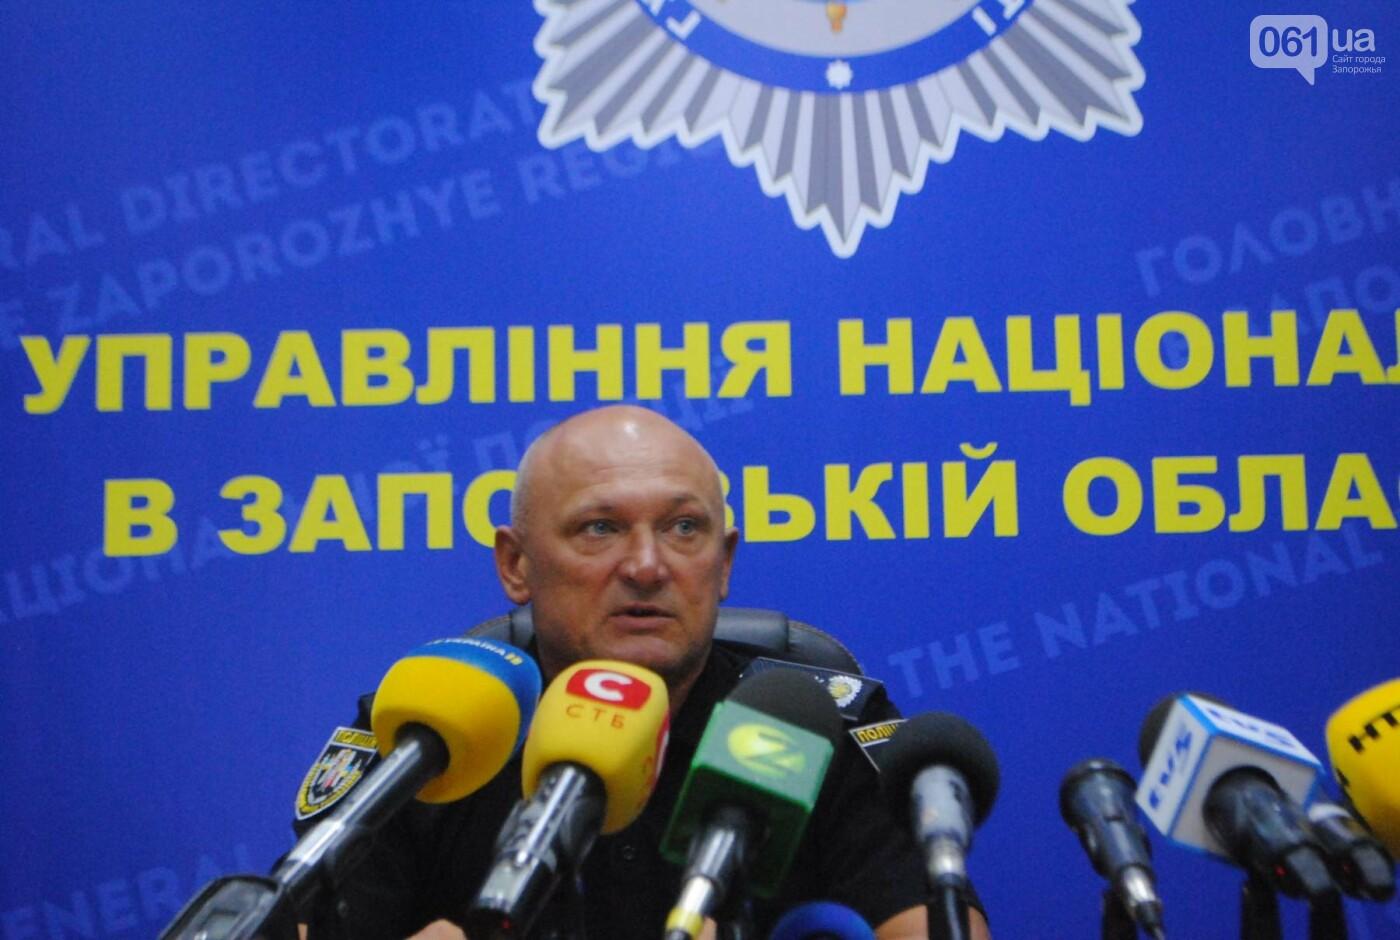 За Олешко следили два дня: в полиции рассказали подробности покушения в Бердянске, - ФОТО, фото-9